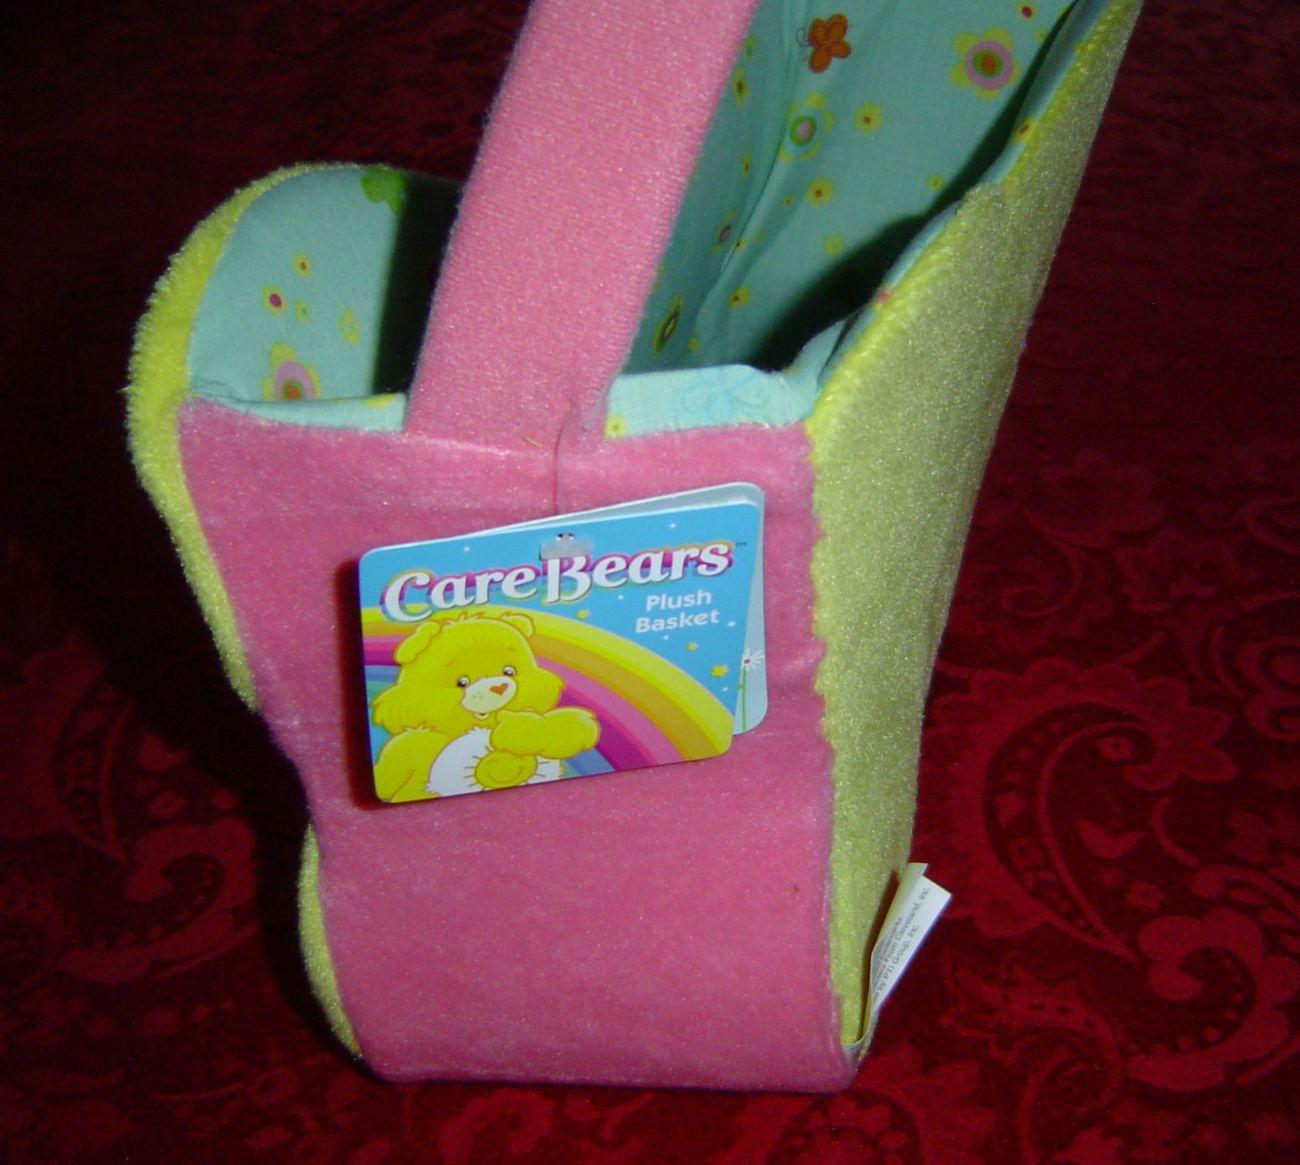 Care Bears Plush Easter Basket Spring Basket flower shaped